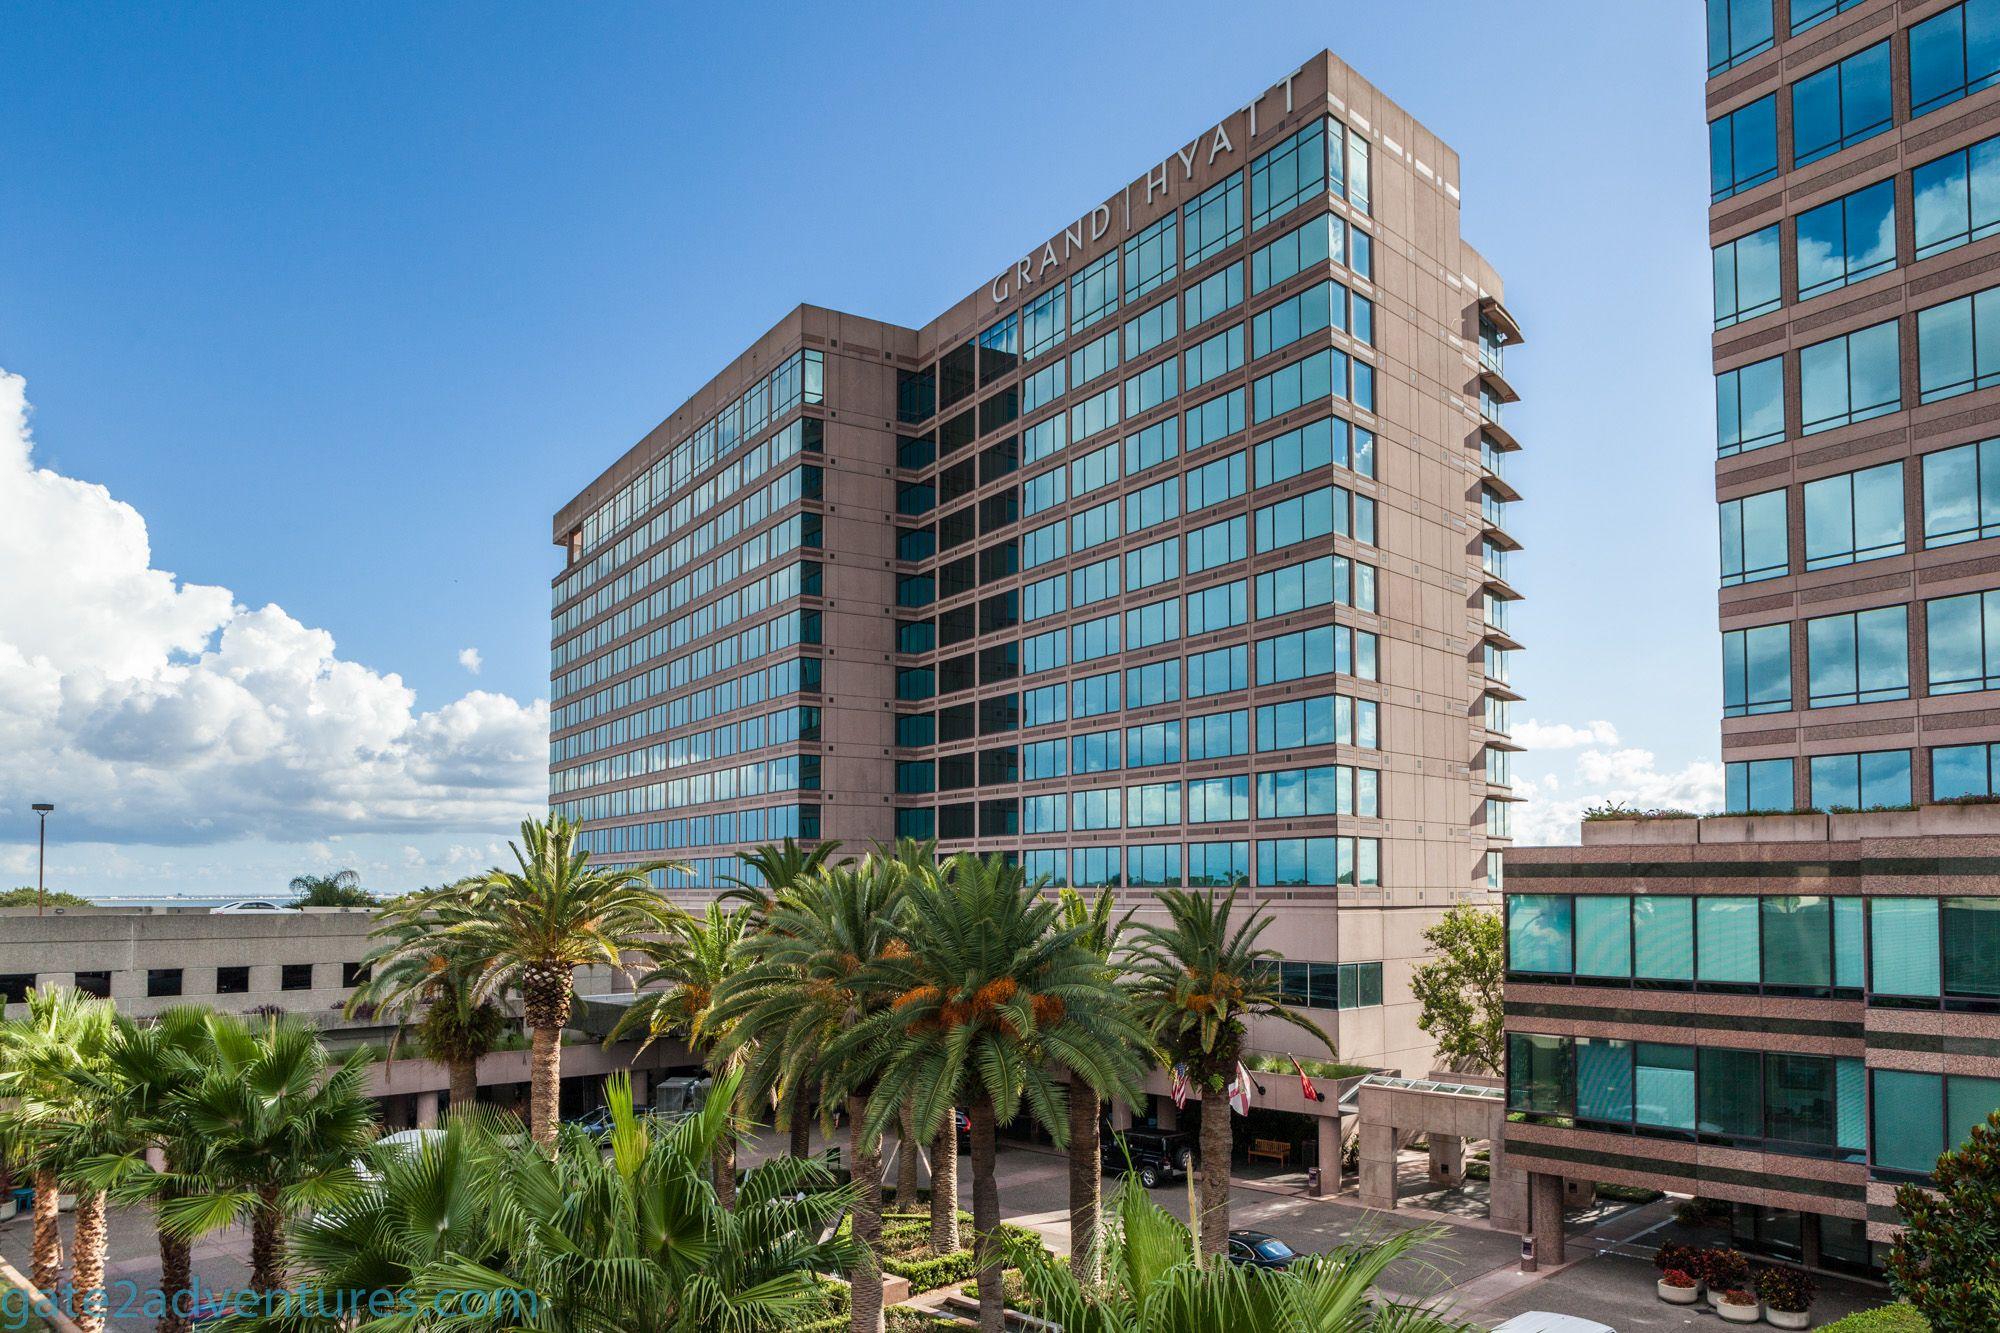 Hotel Review: Grand Hyatt Tampa Bay